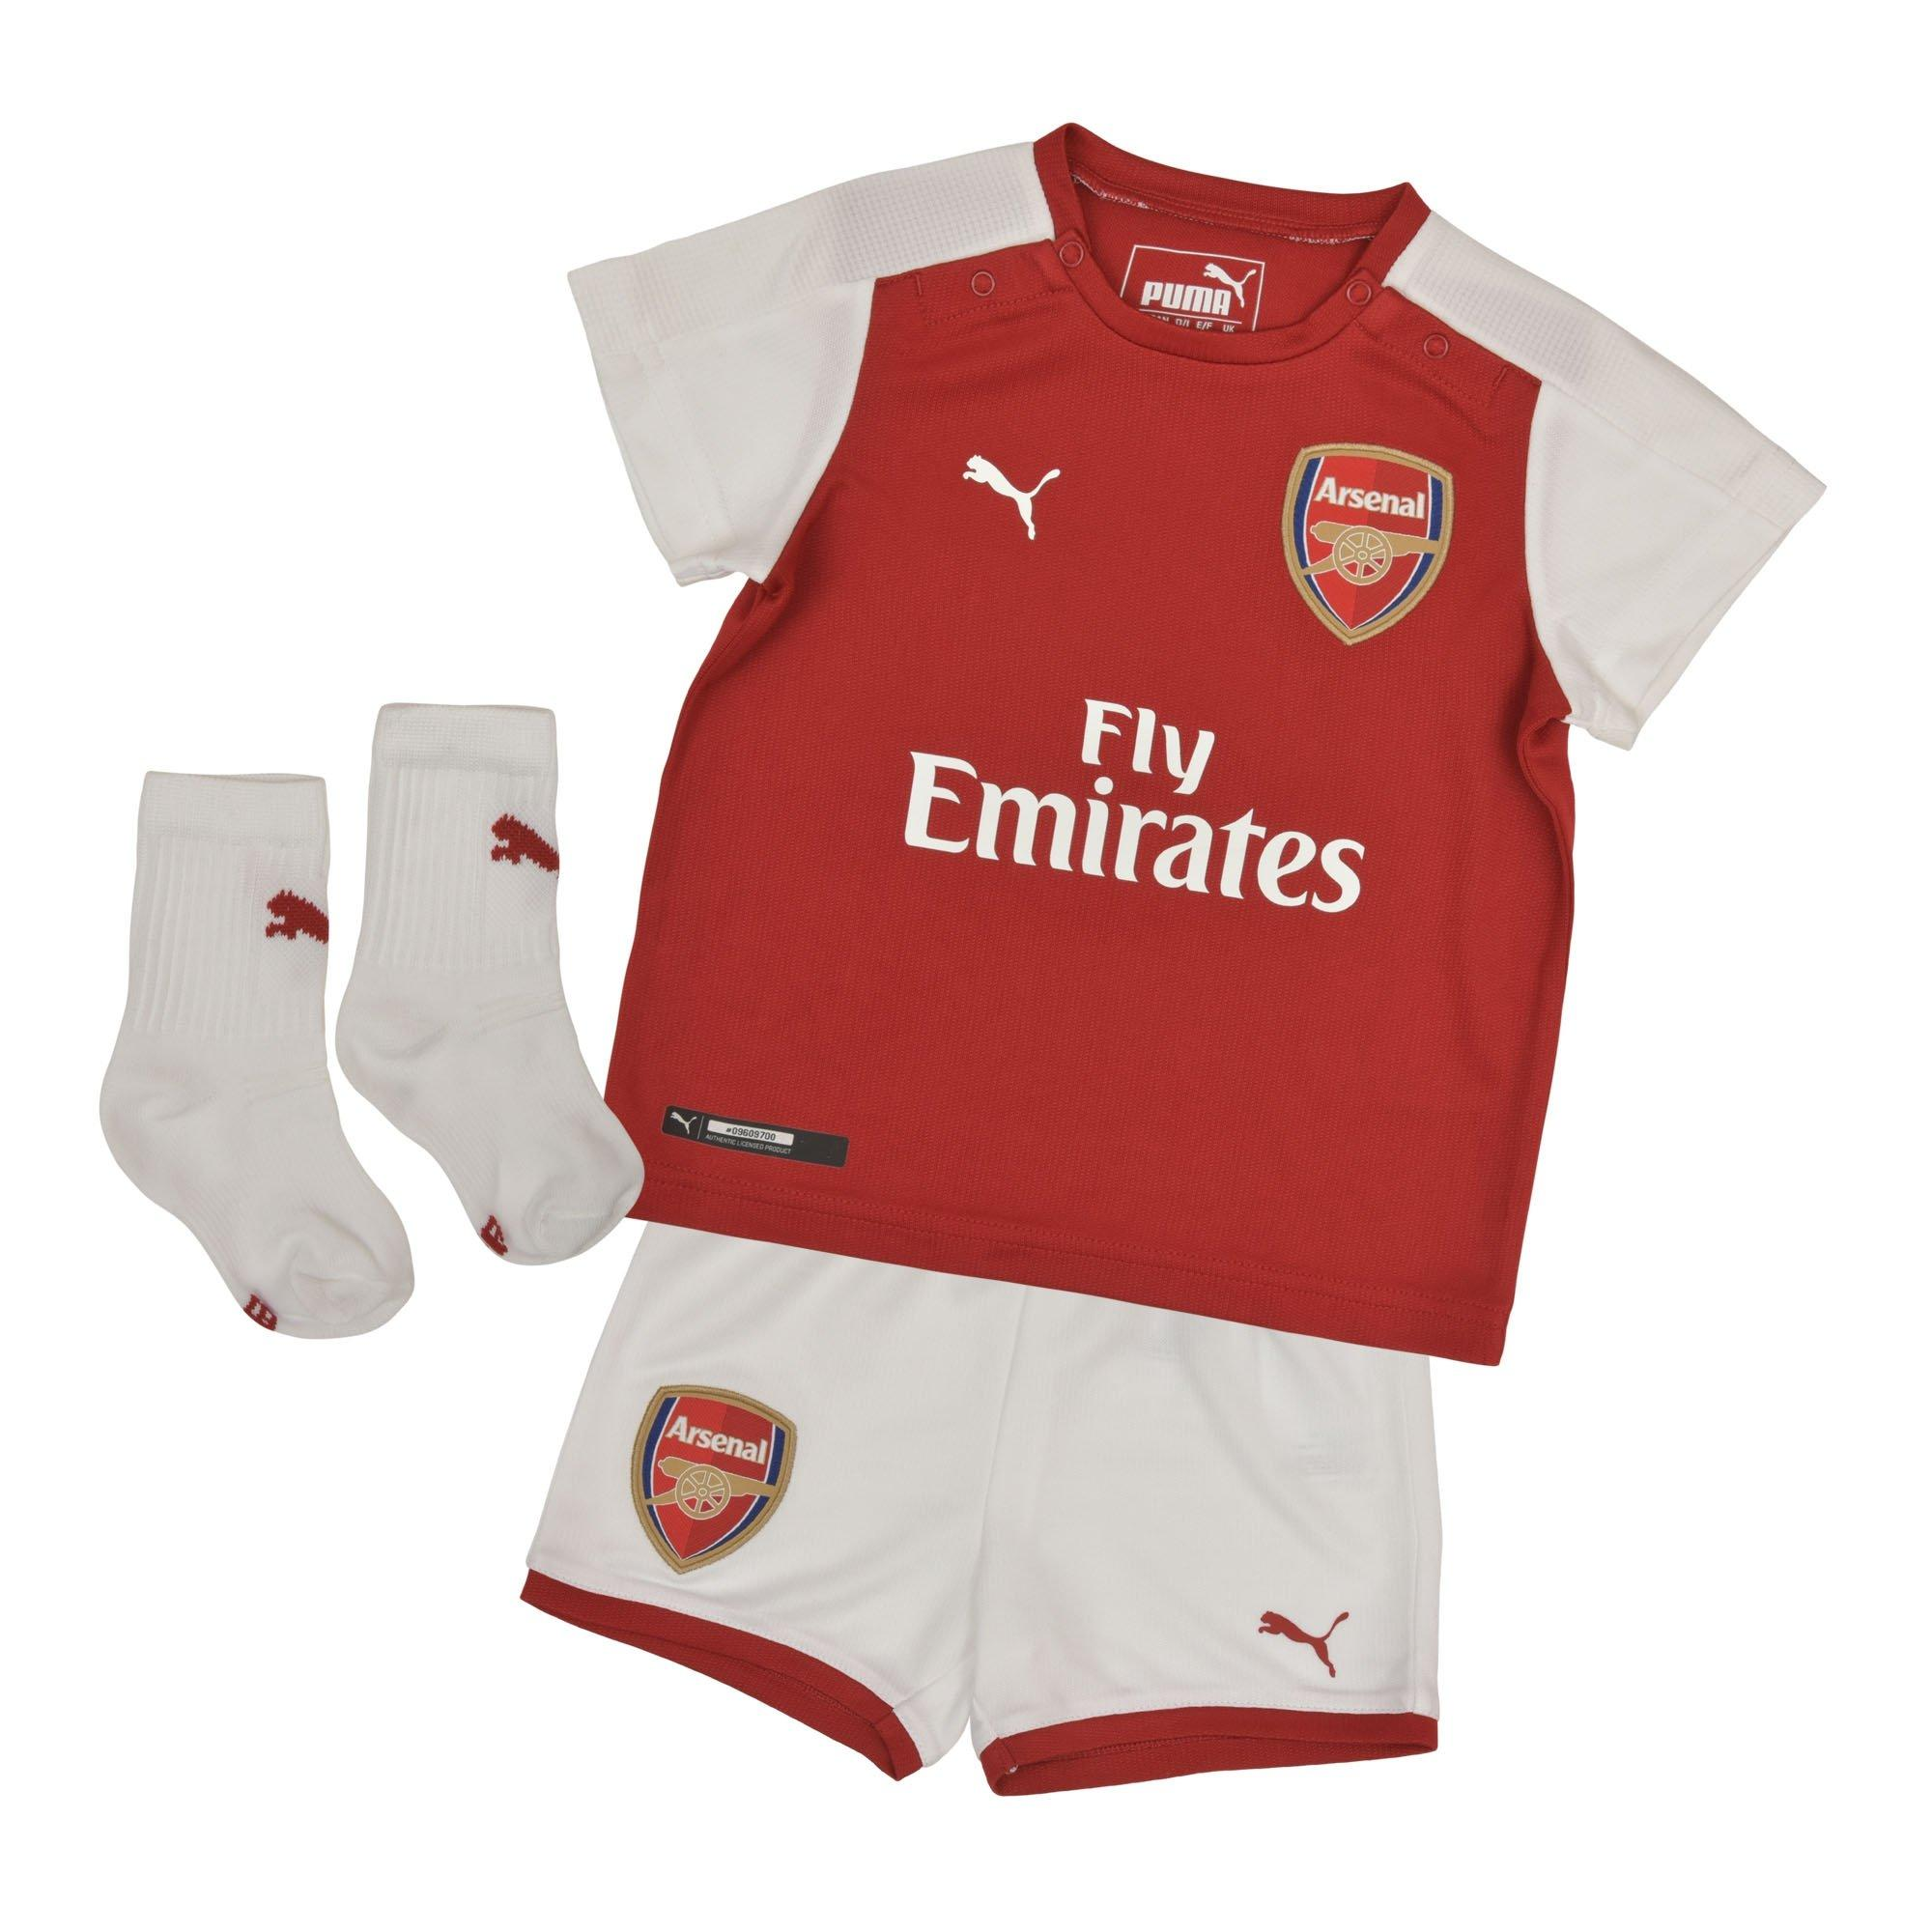 ea12ec1d6 custom arsenal jersey on sale   OFF48% Discounts